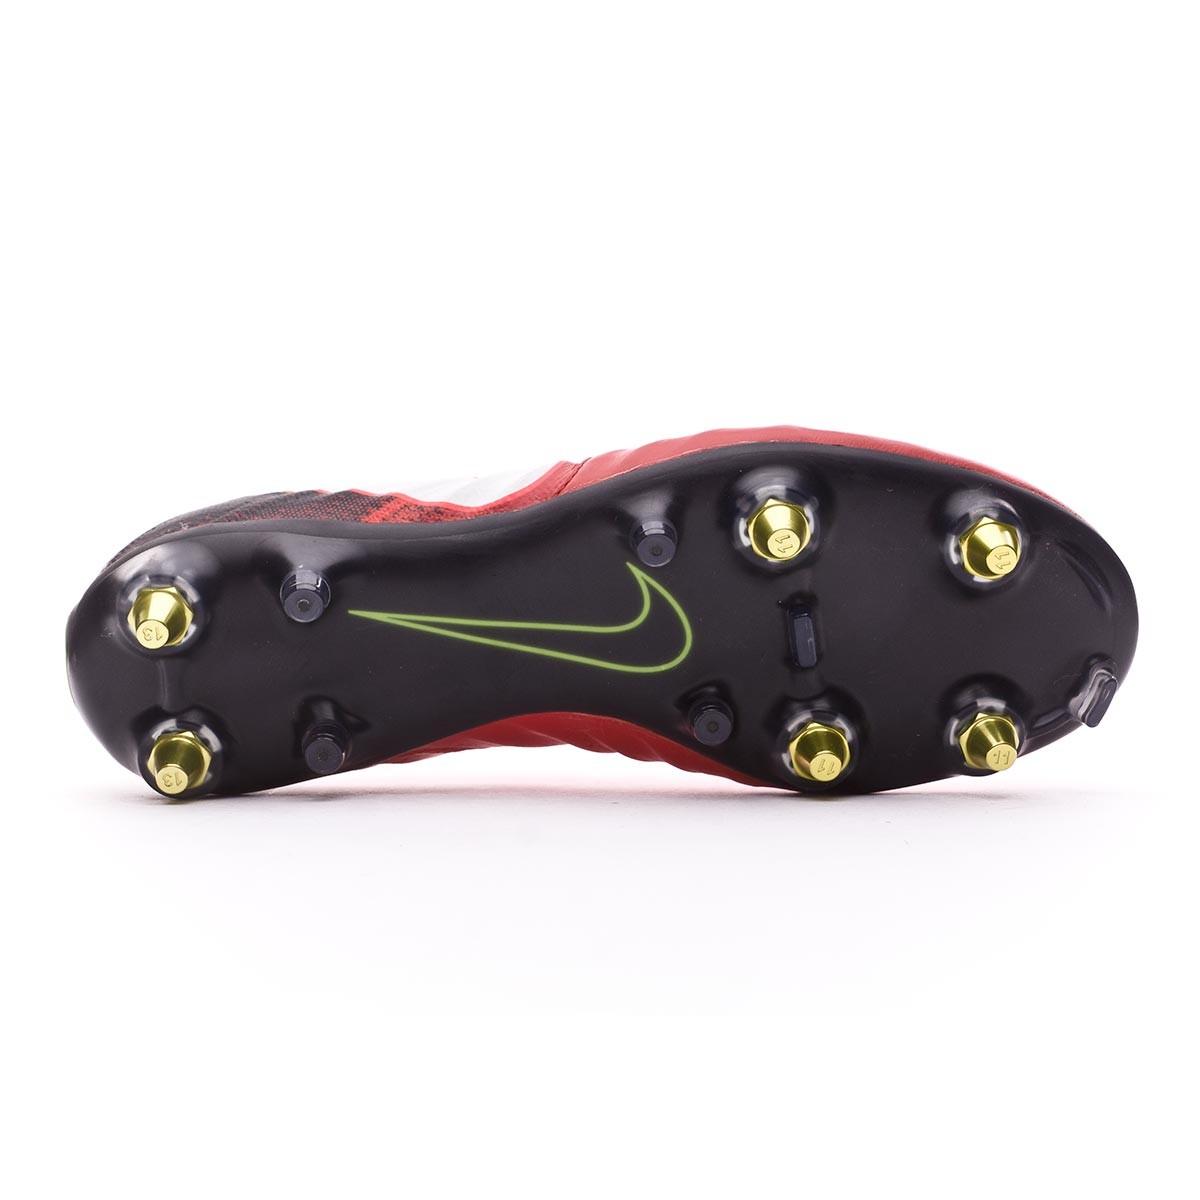 030972f3e3d9 Football Boots Nike Tiempo Legend VII Anti-Clog ACC SG-Pro Black-White- University red - Tienda de fútbol Fútbol Emotion